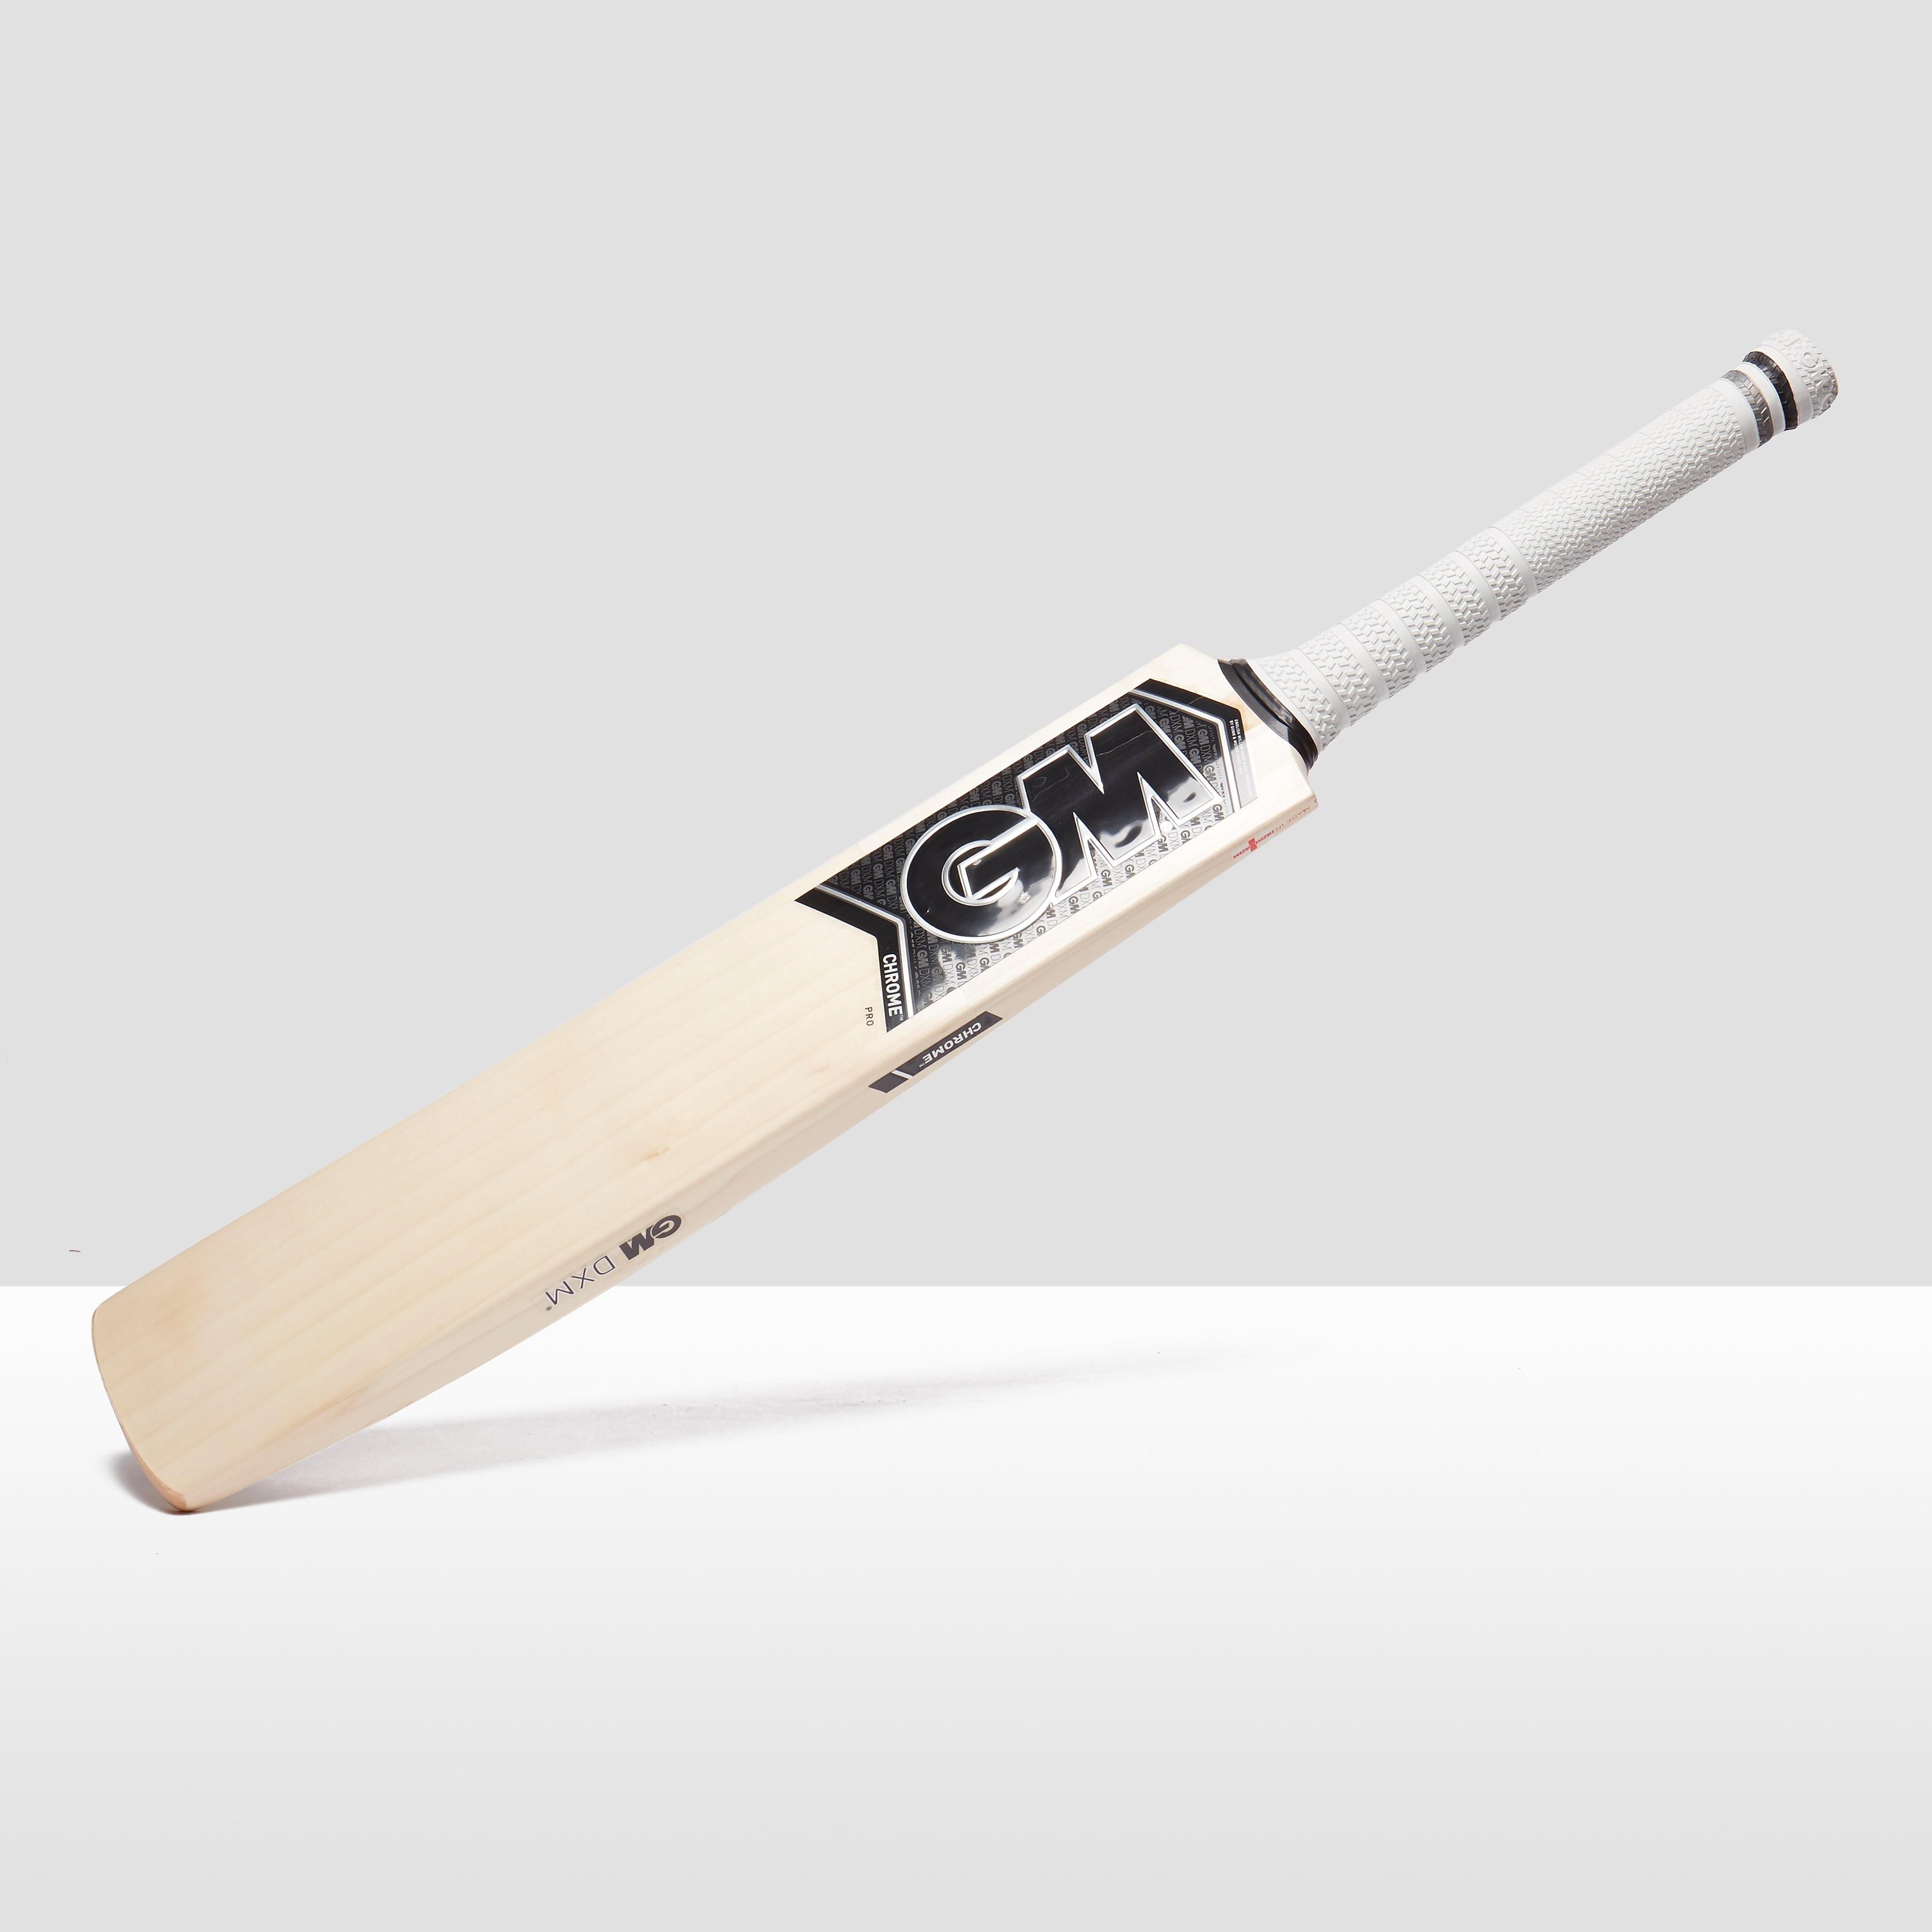 Gunn & Moore Chrome L555 Dxm 808 Cricket Bat